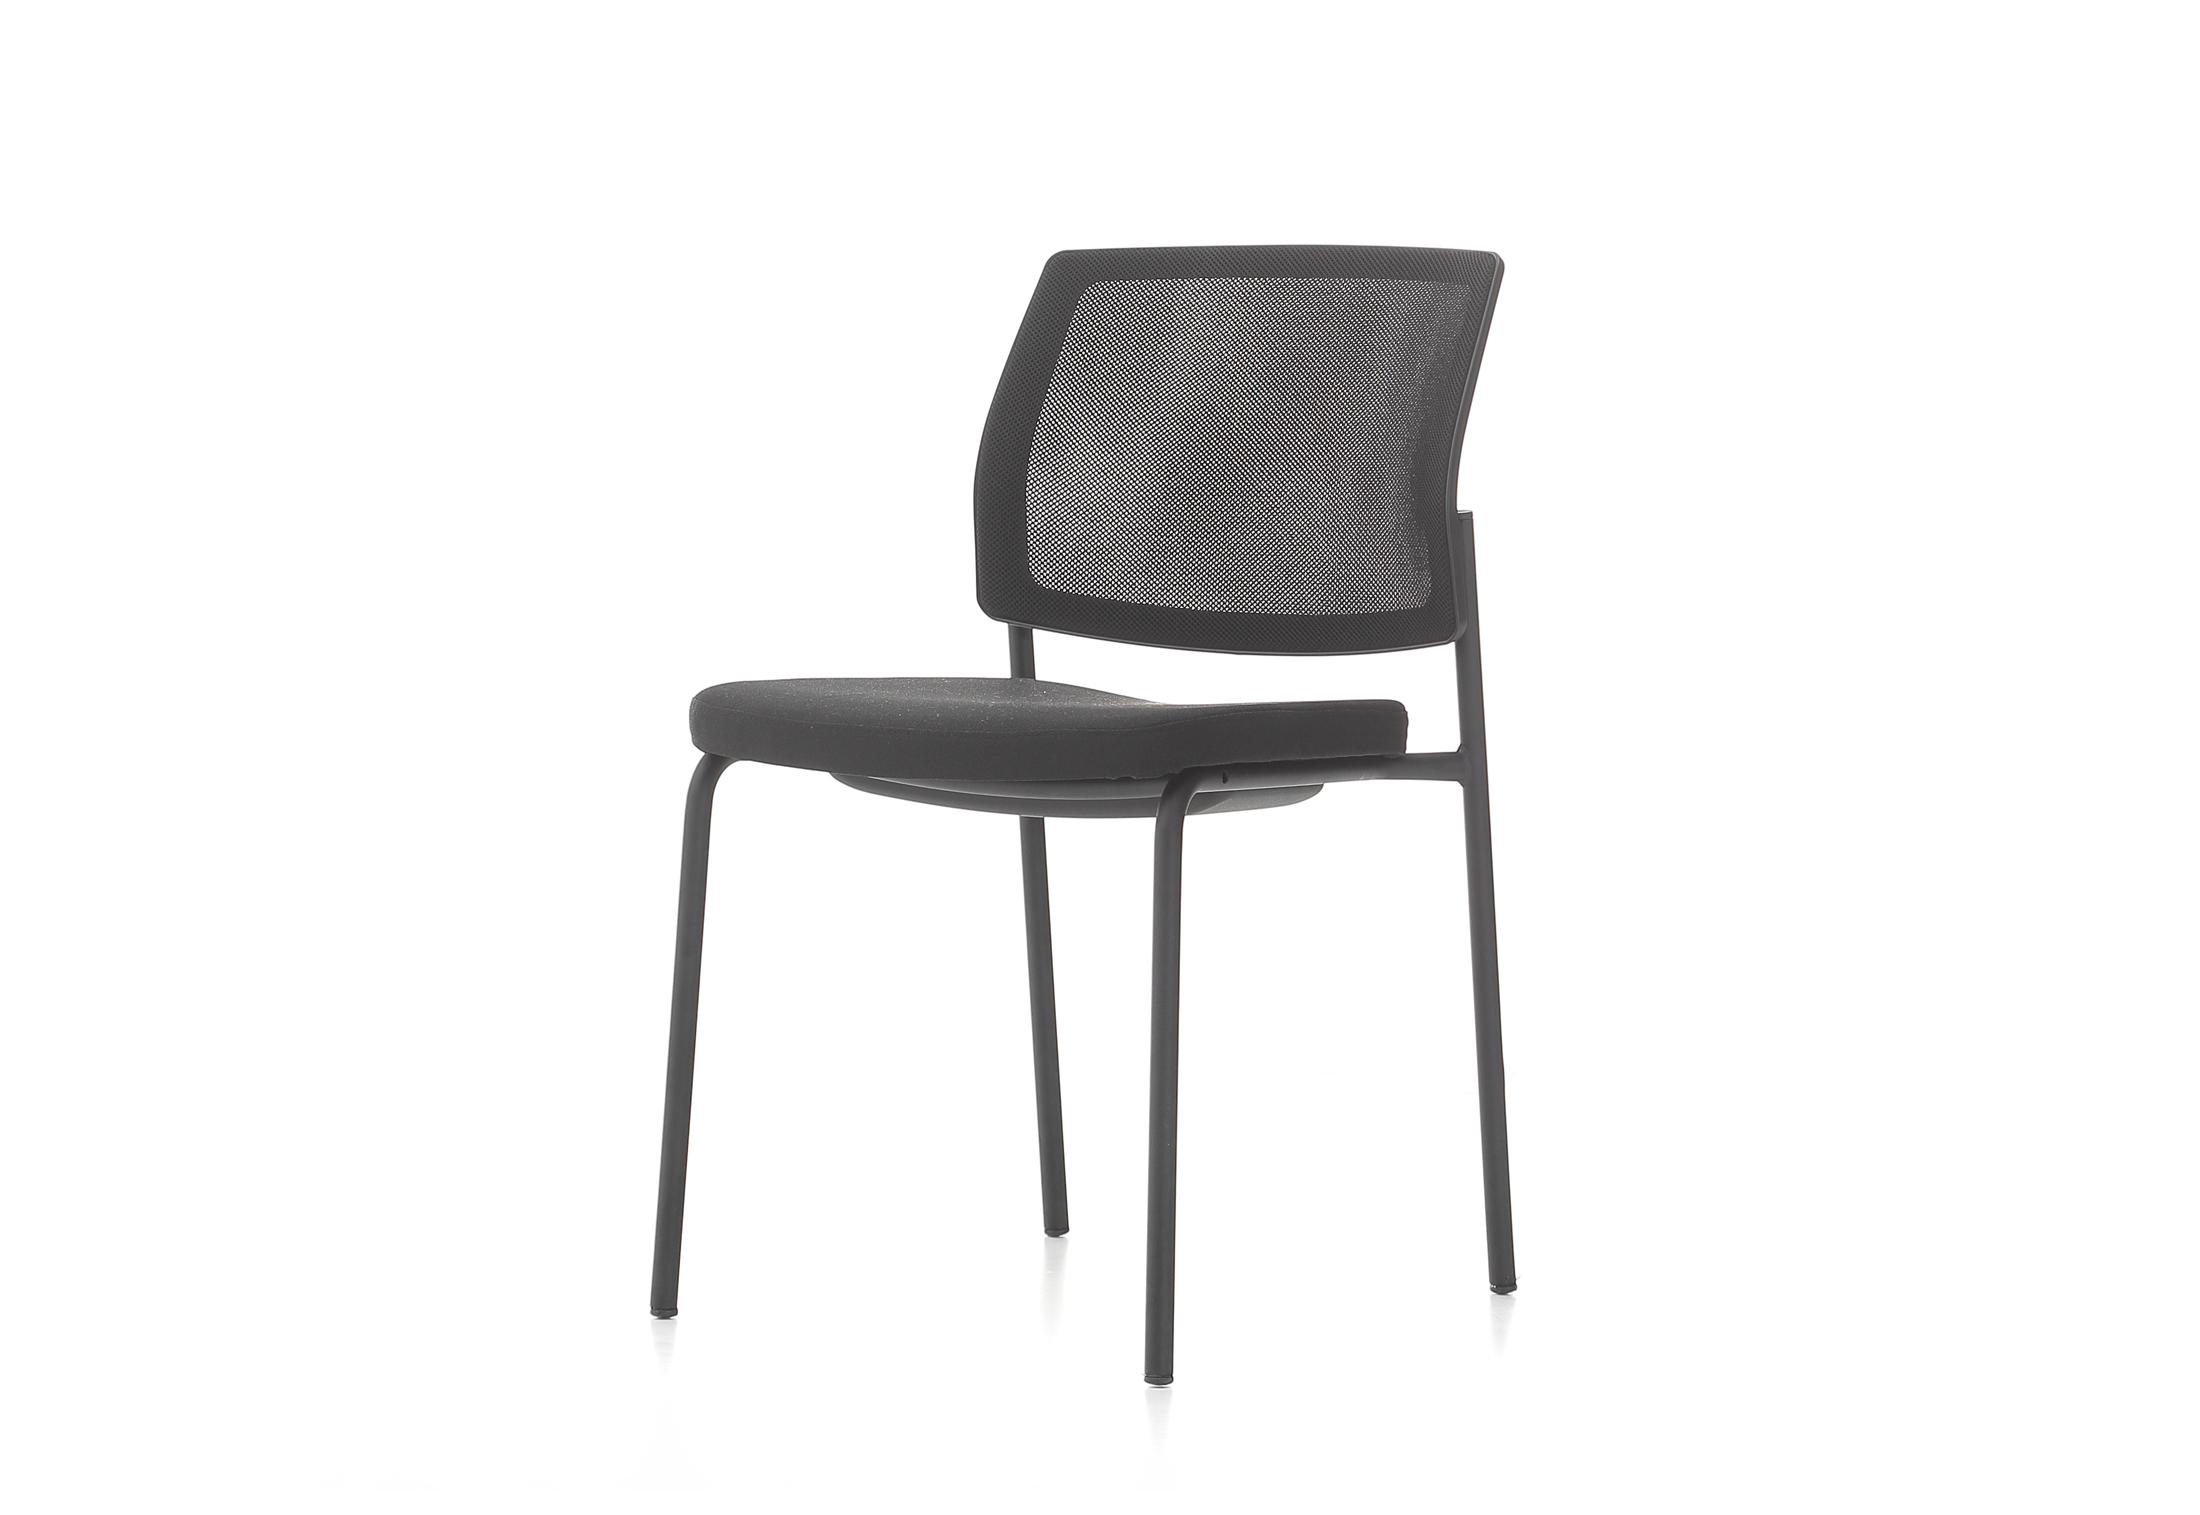 trea stuhl gepolstert von nurus stylepark. Black Bedroom Furniture Sets. Home Design Ideas